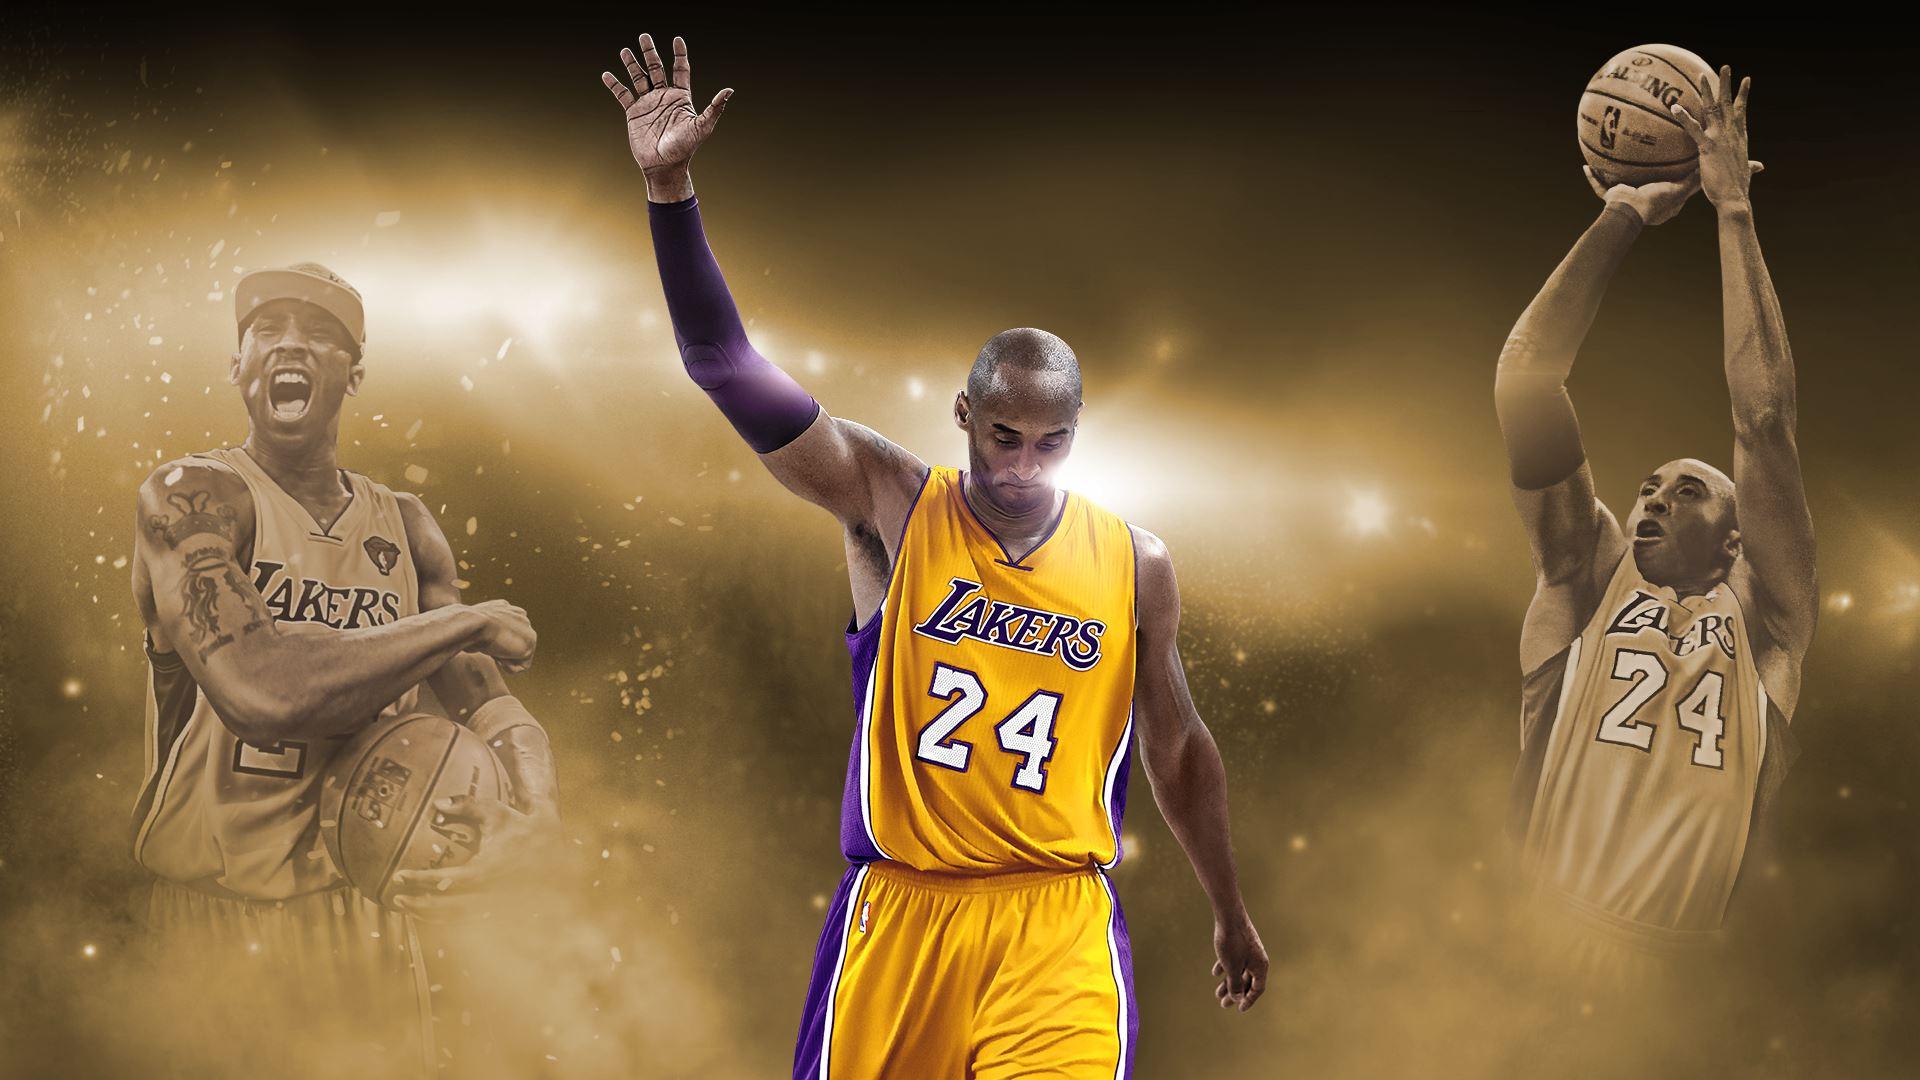 concours NBA 2K17